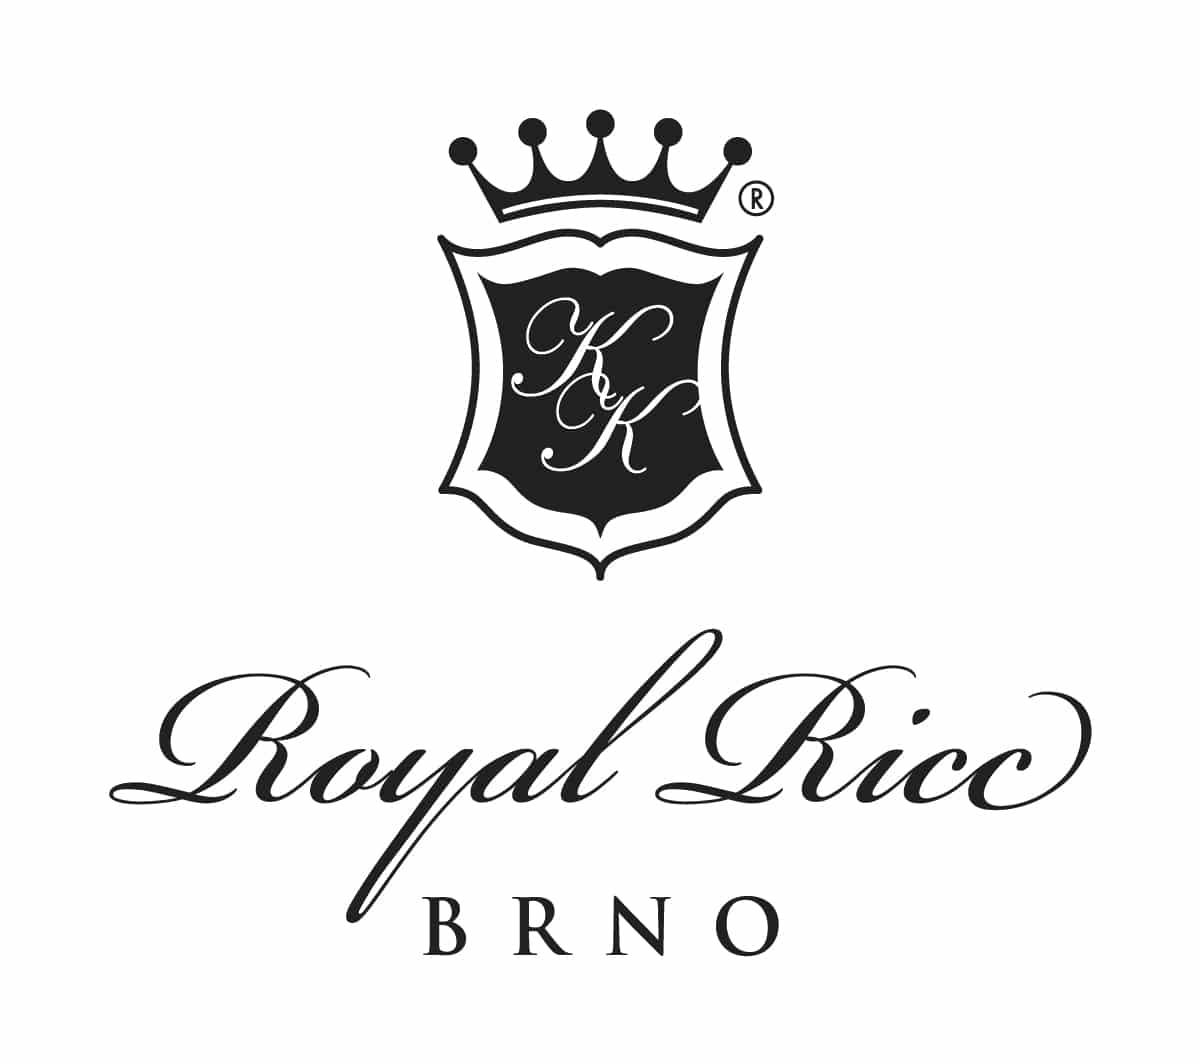 ROYAL RICC BRNO